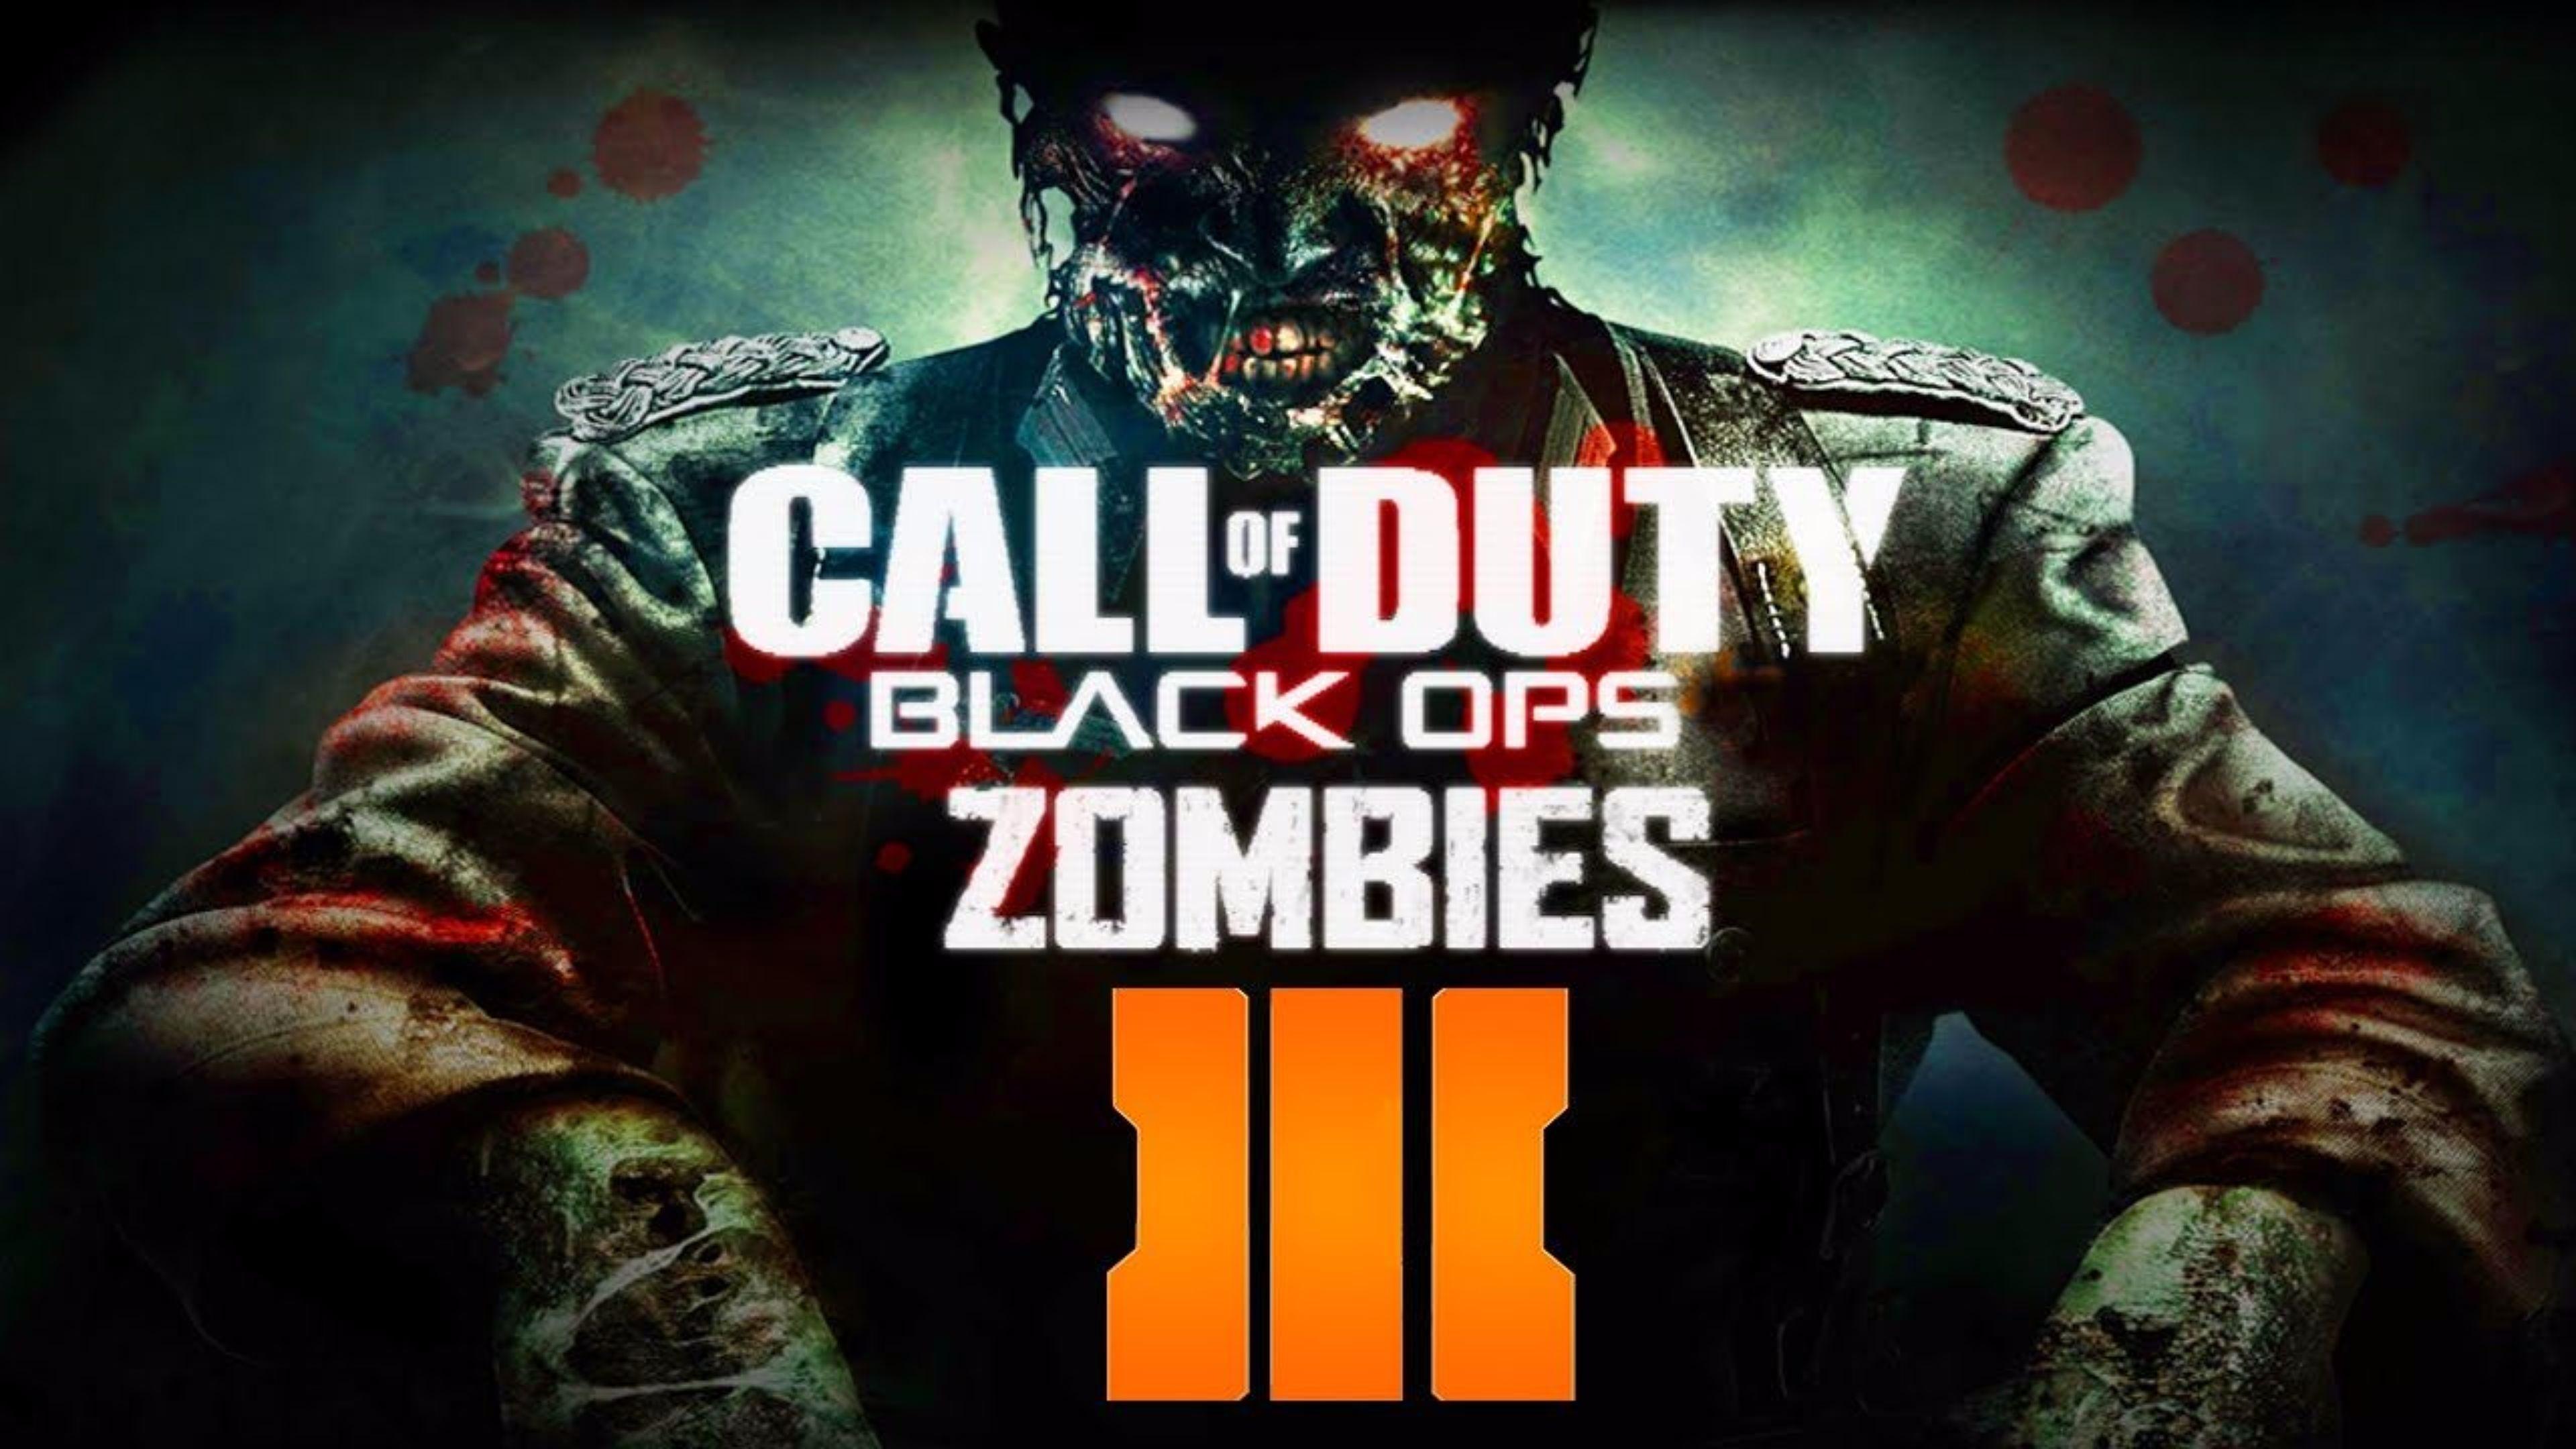 black ops zombies wallpaper #12